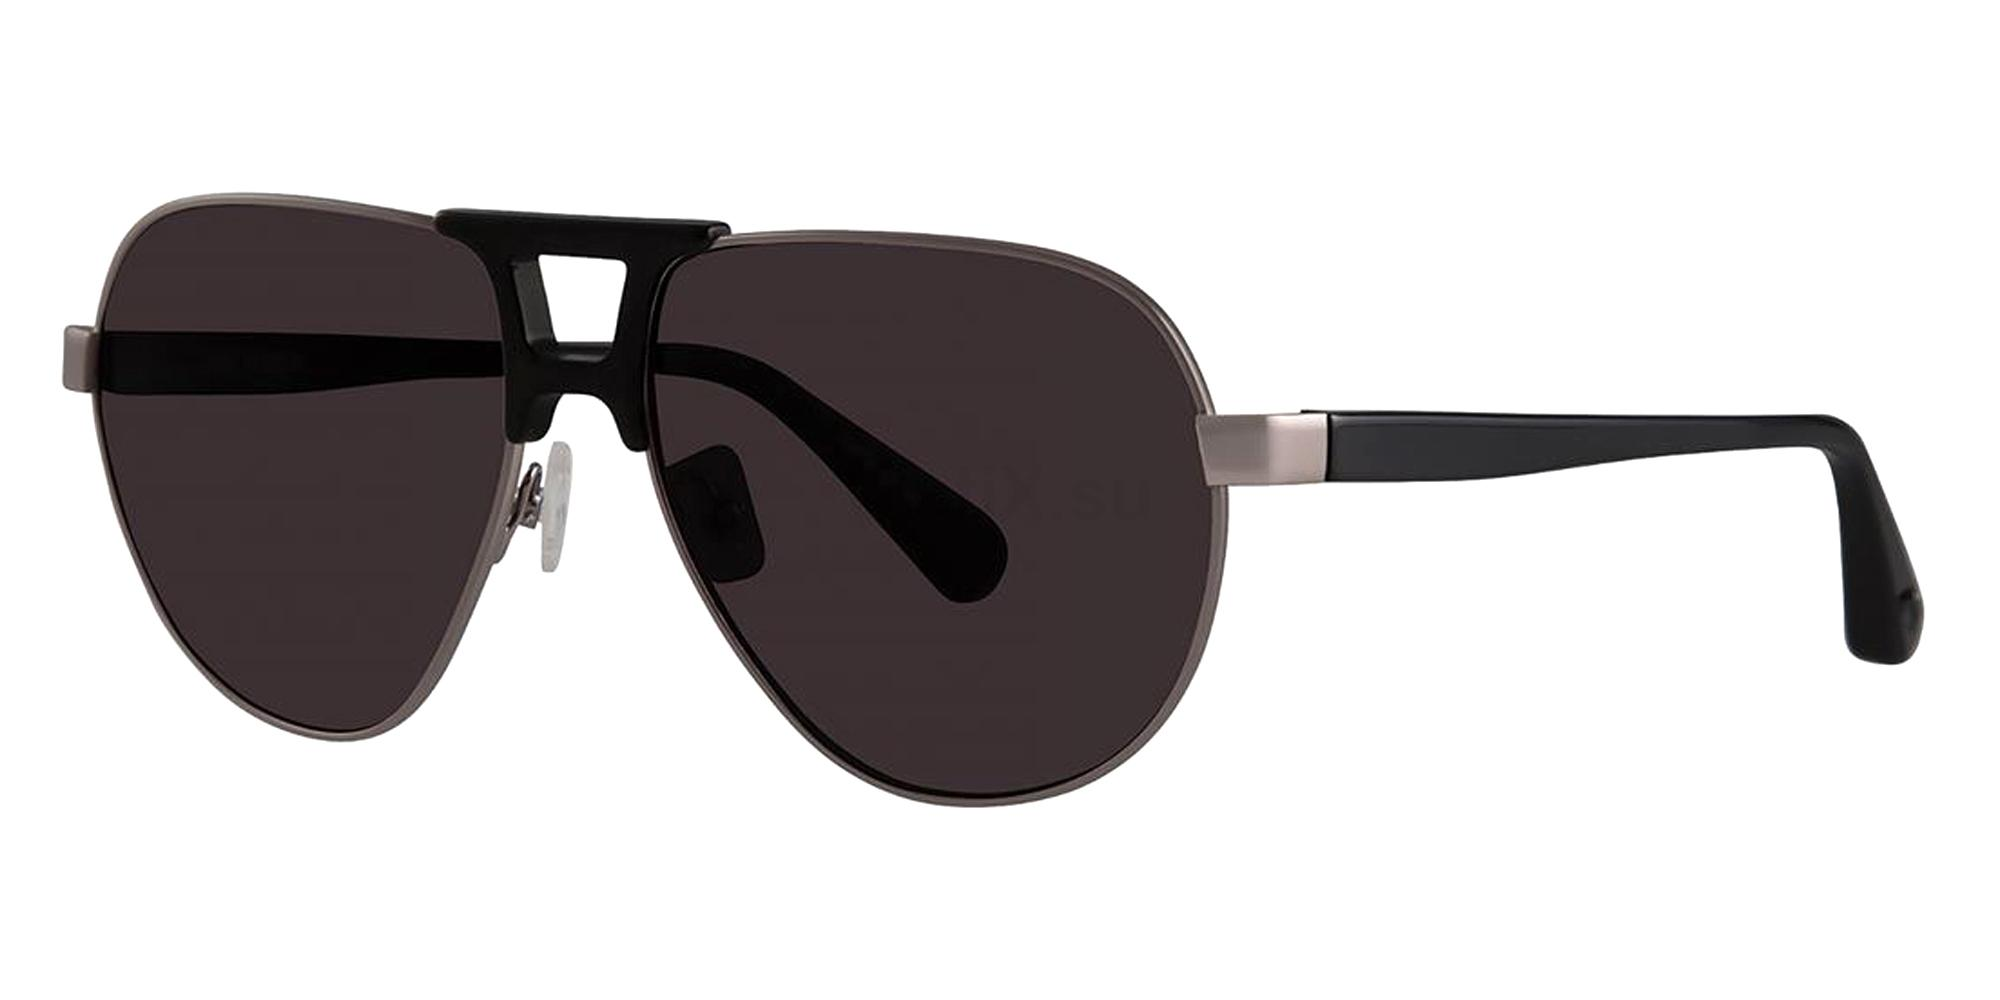 Black ARROH Sunglasses, Zac Posen